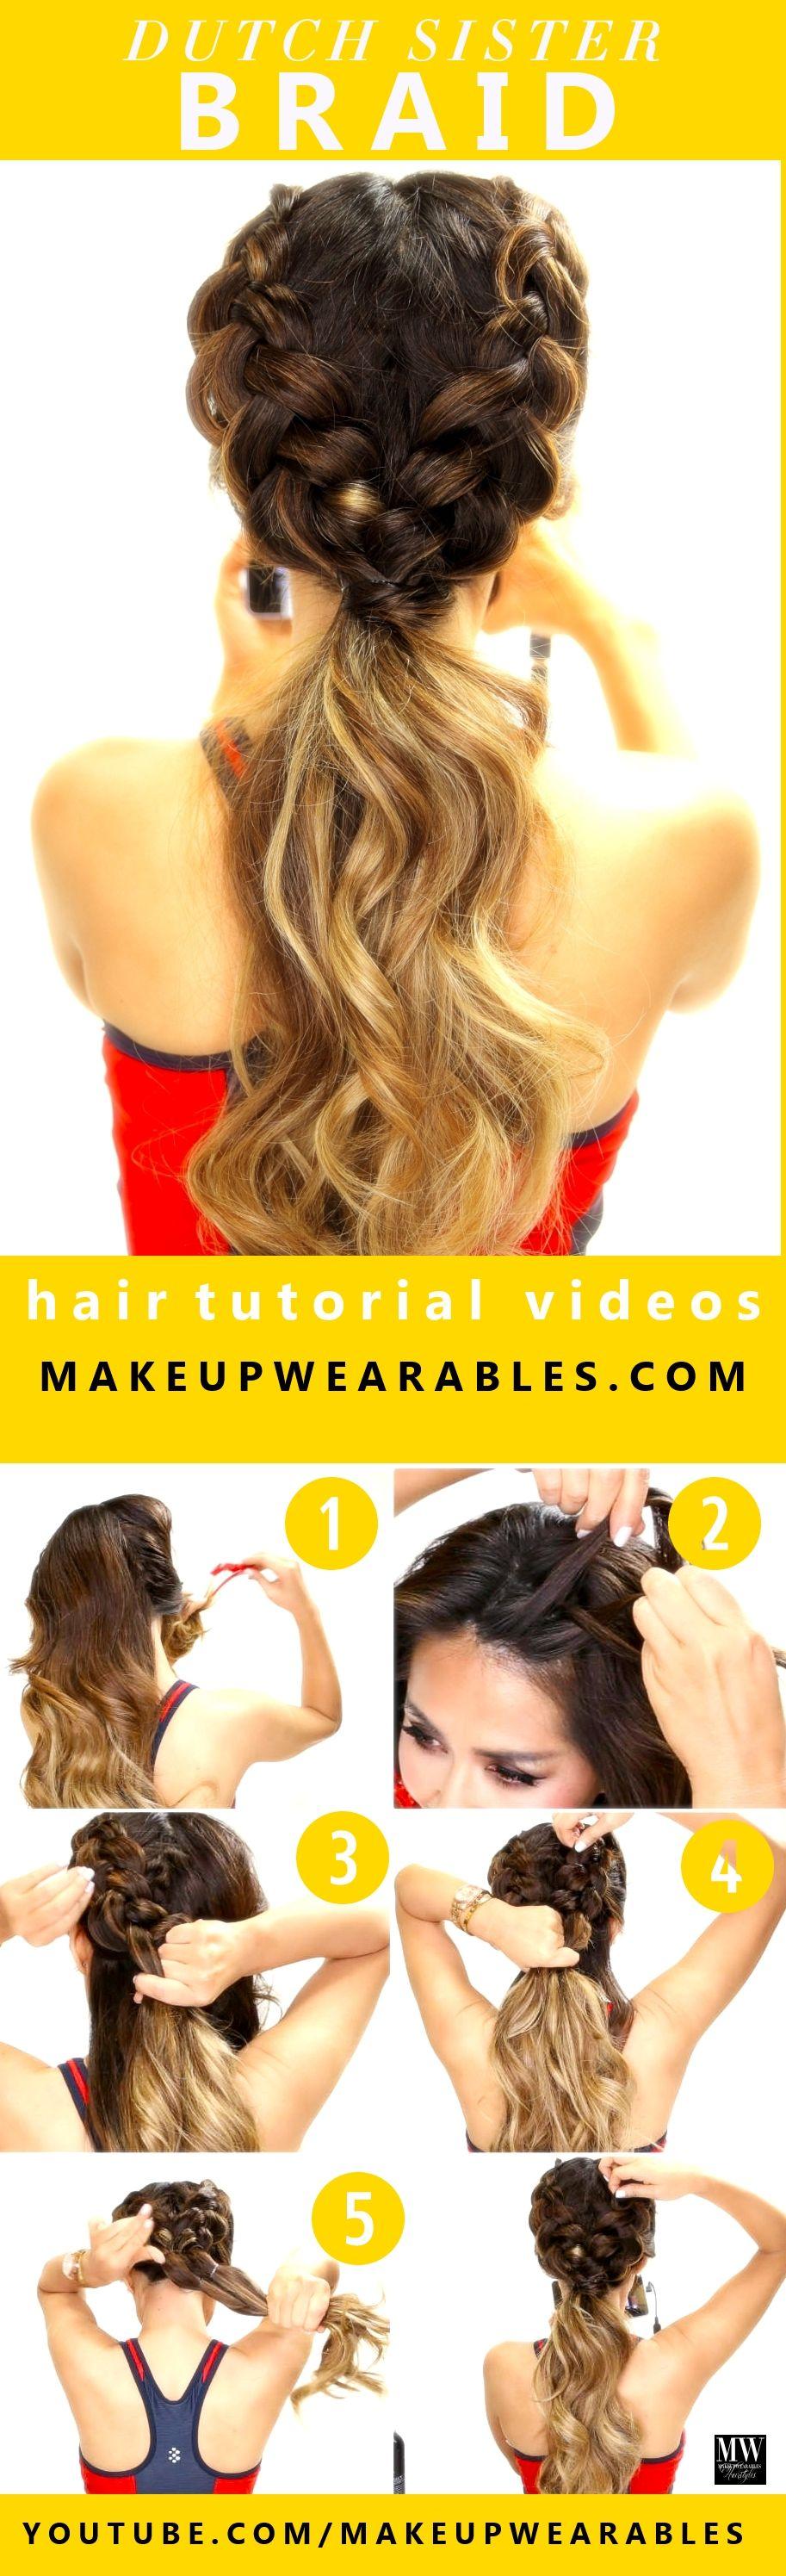 cute workout gym hairstyles with braids hair tutorial hair